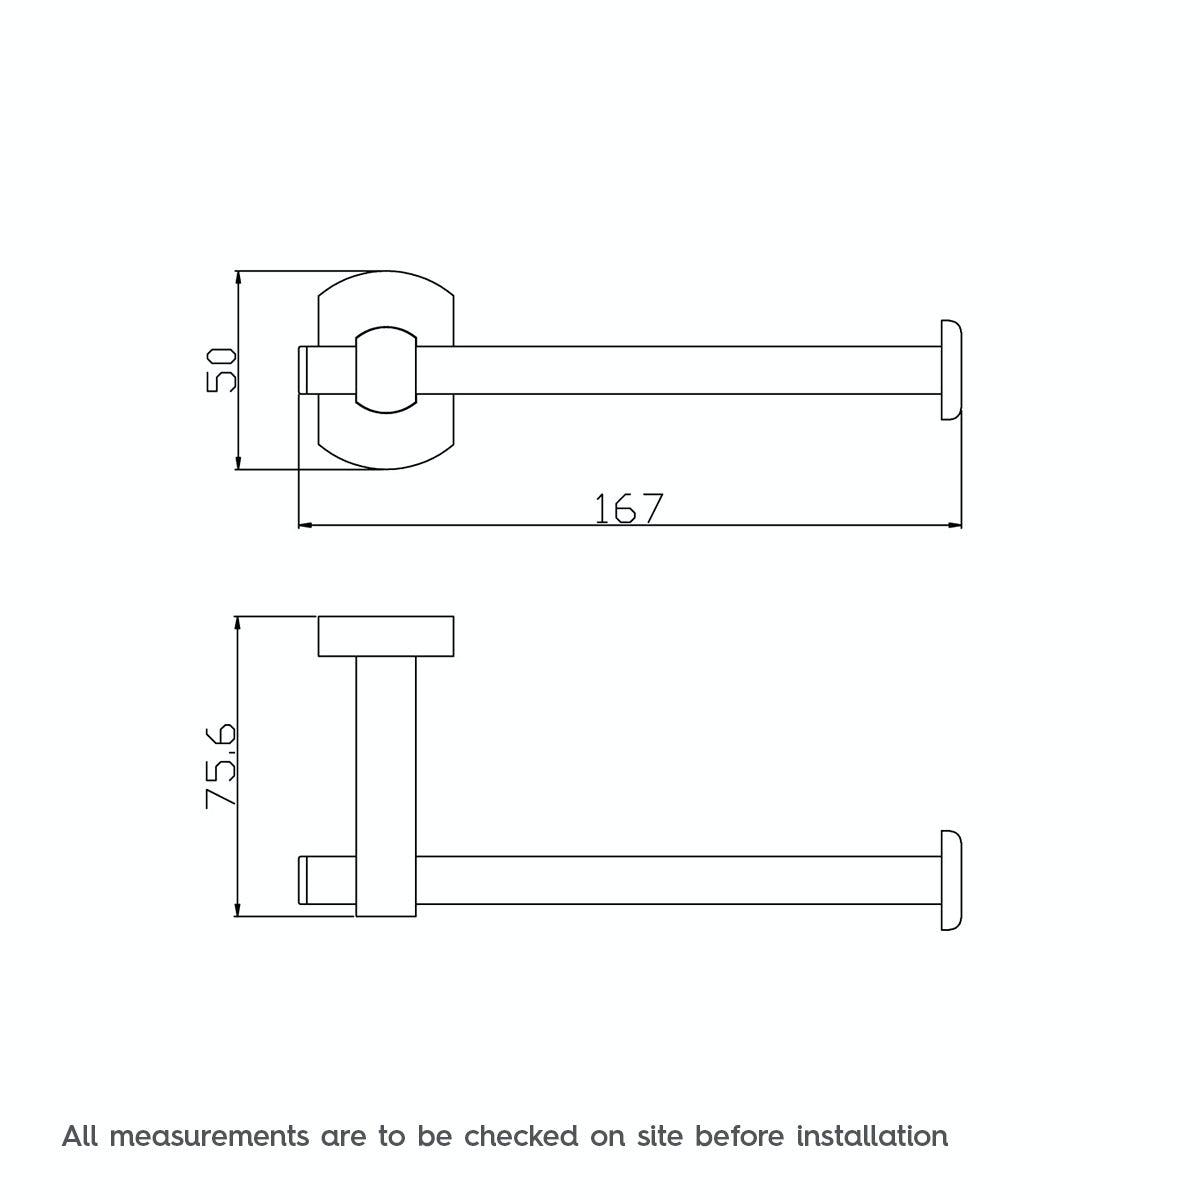 Dimensions for Solar toilet roll holder